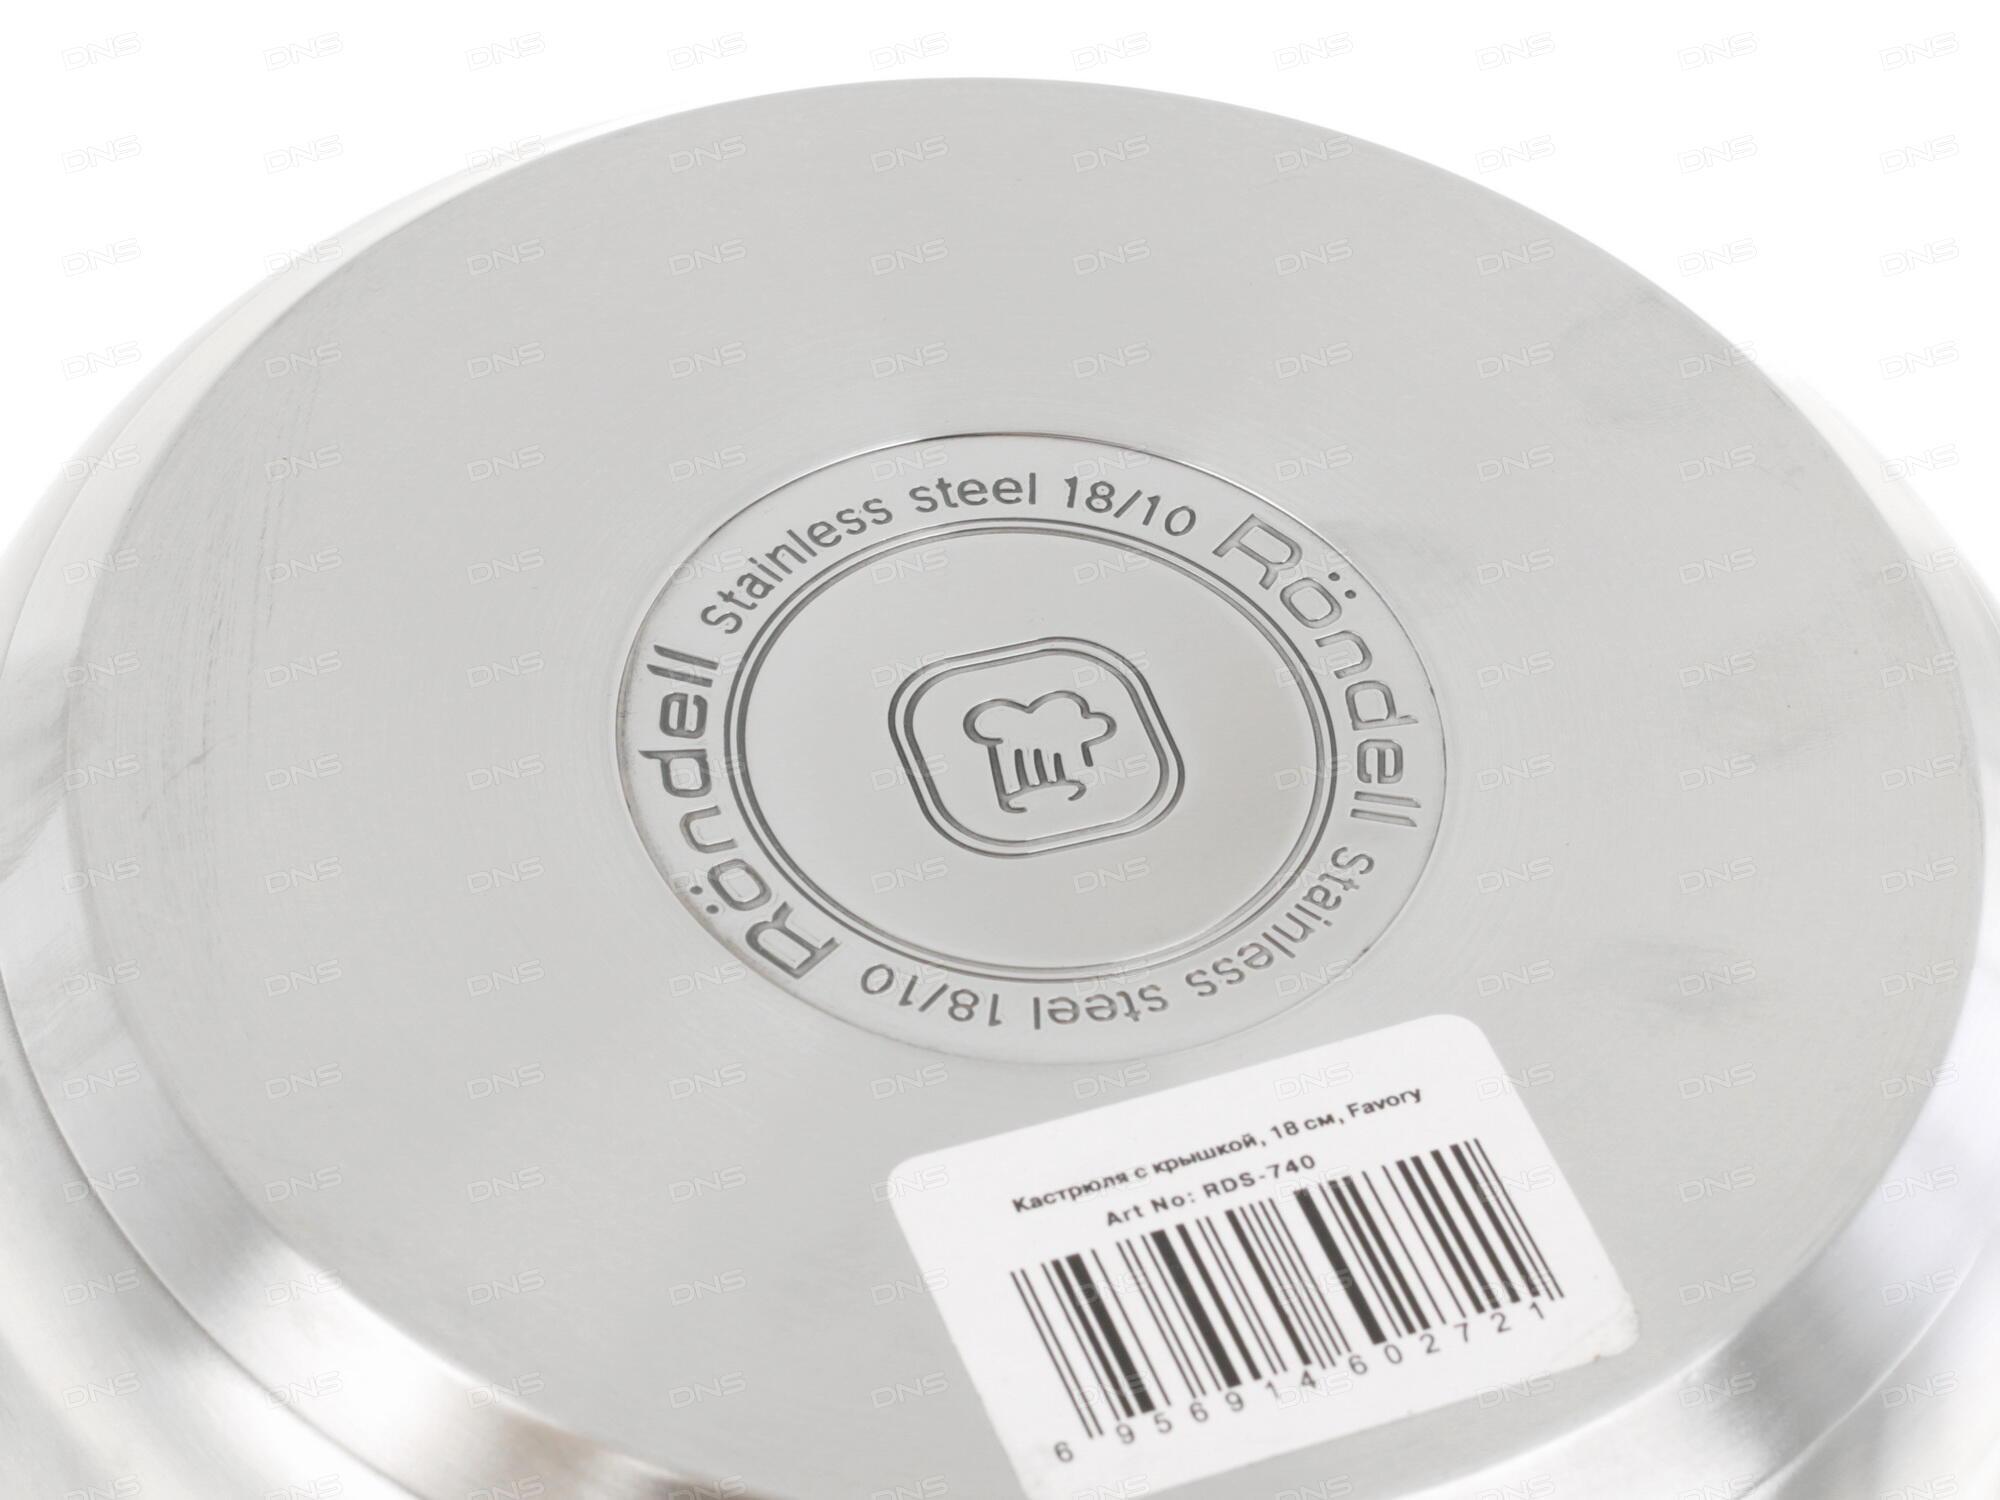 Кастрюля Rondell Favory RDS-740 2.4л 18см стеклянная крышка нержавеющая сталь серебристый